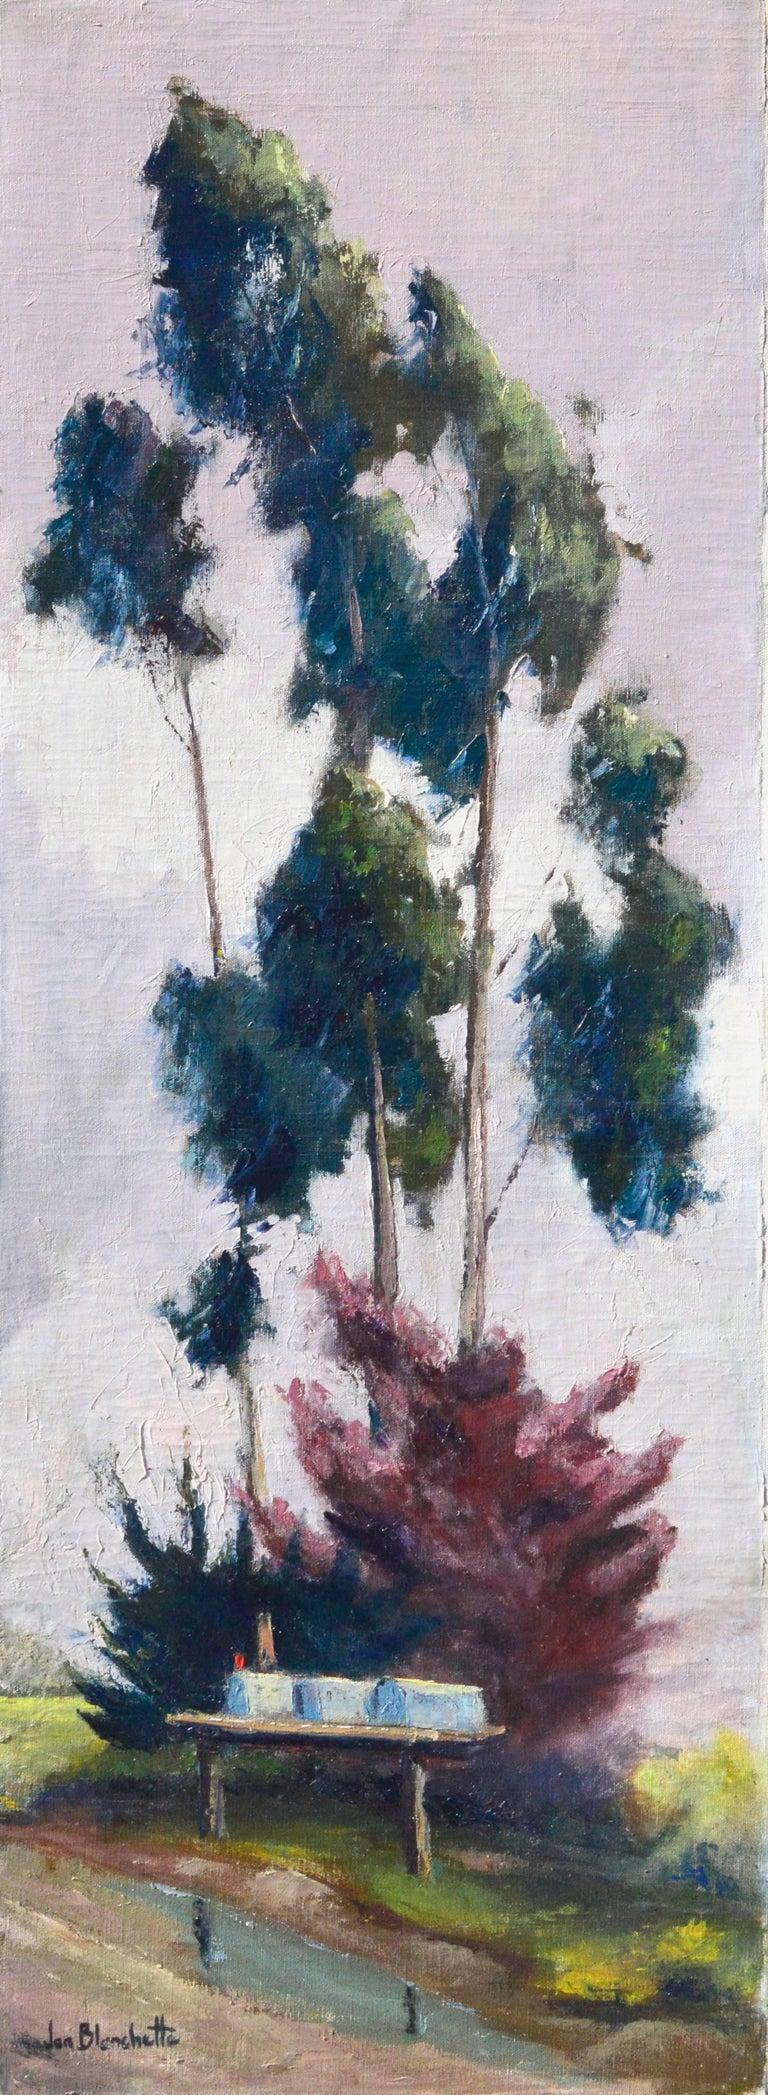 Jon Blanchette Landscape Painting - Eucalyptus by Road